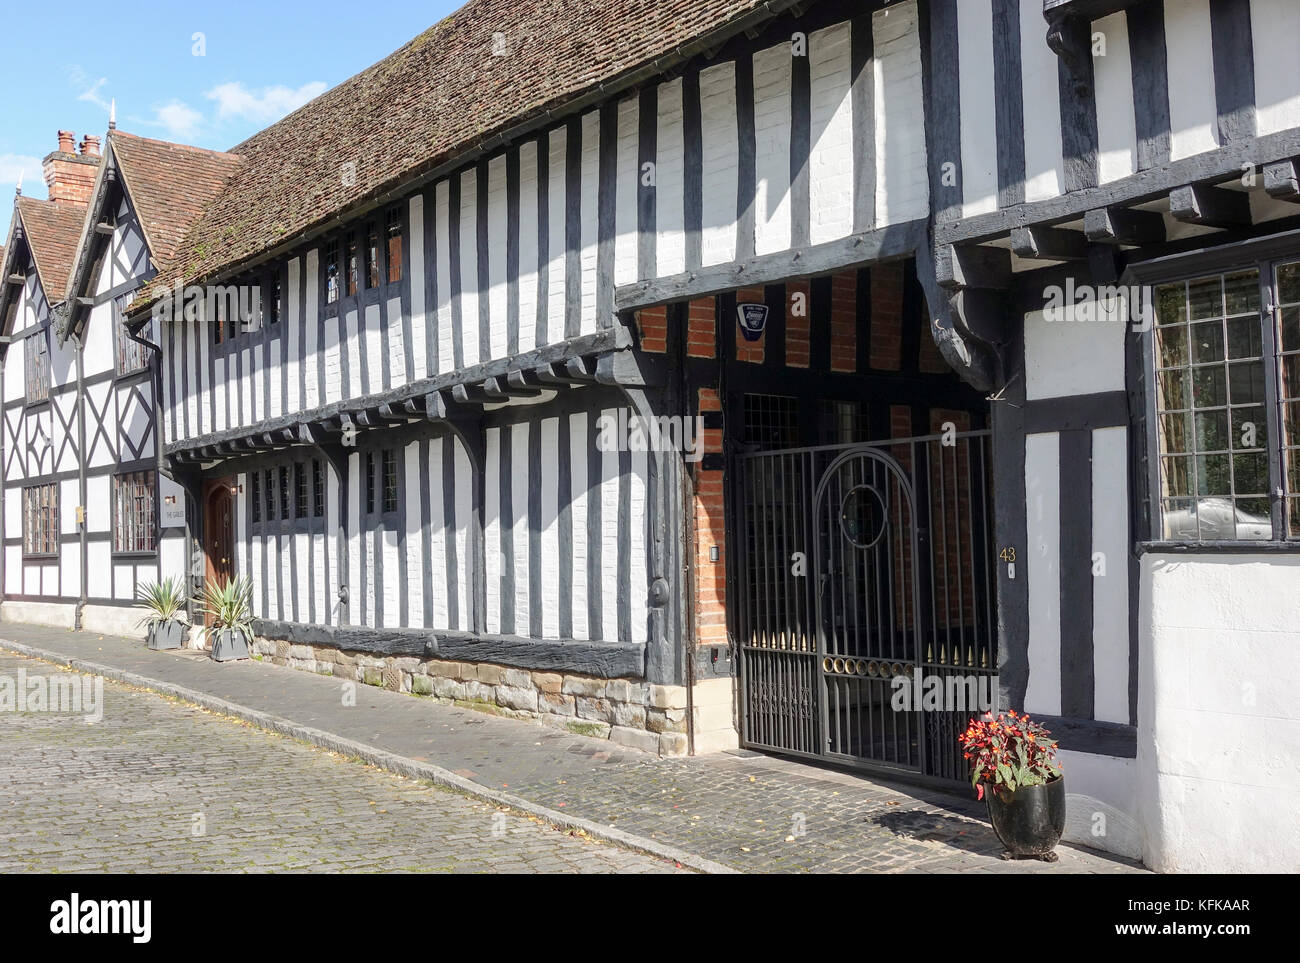 Mill Street, Warwick - Stock Image